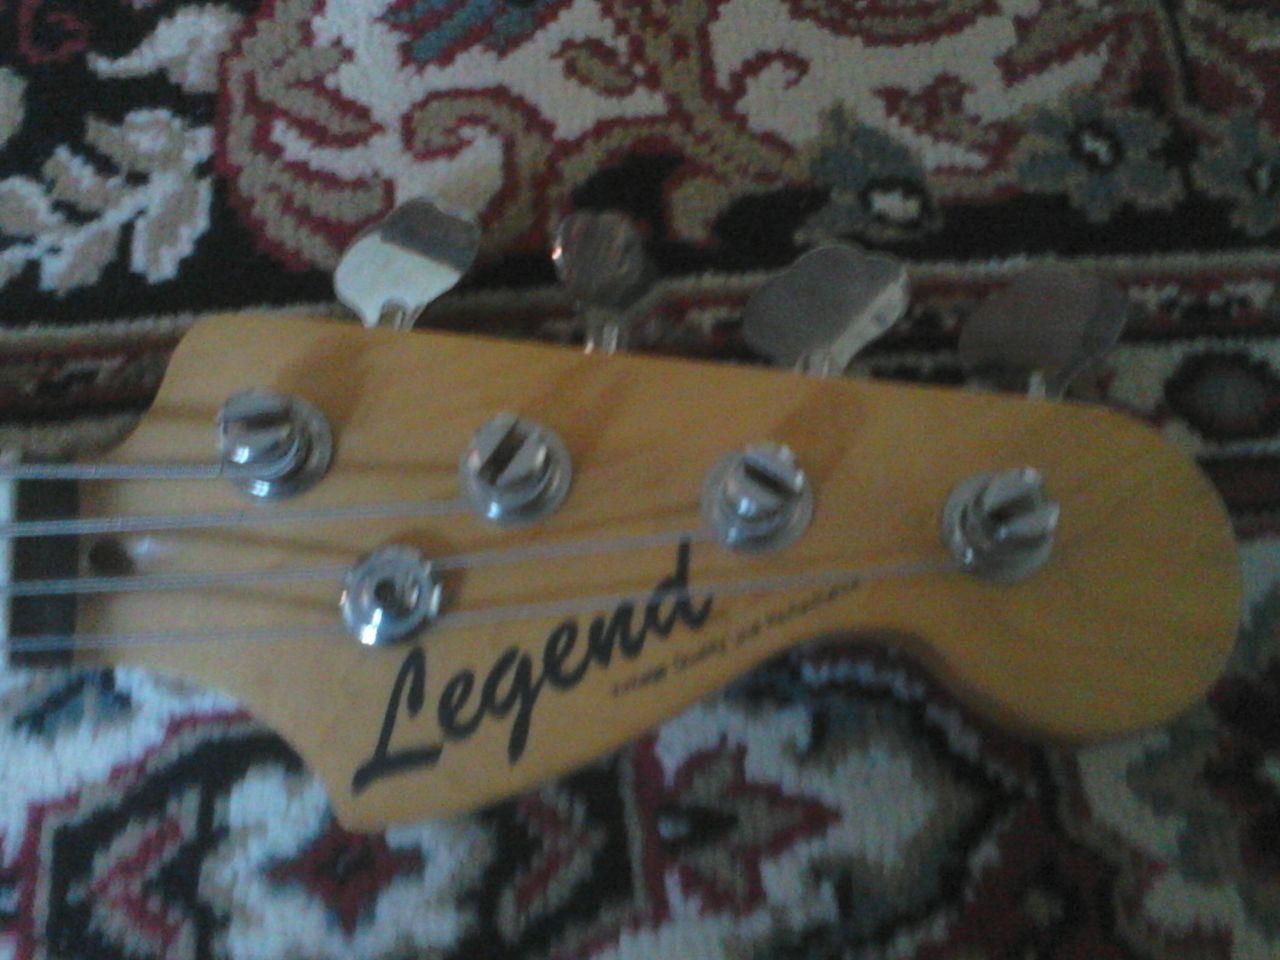 Contrabaixo da Legend DSC_0011